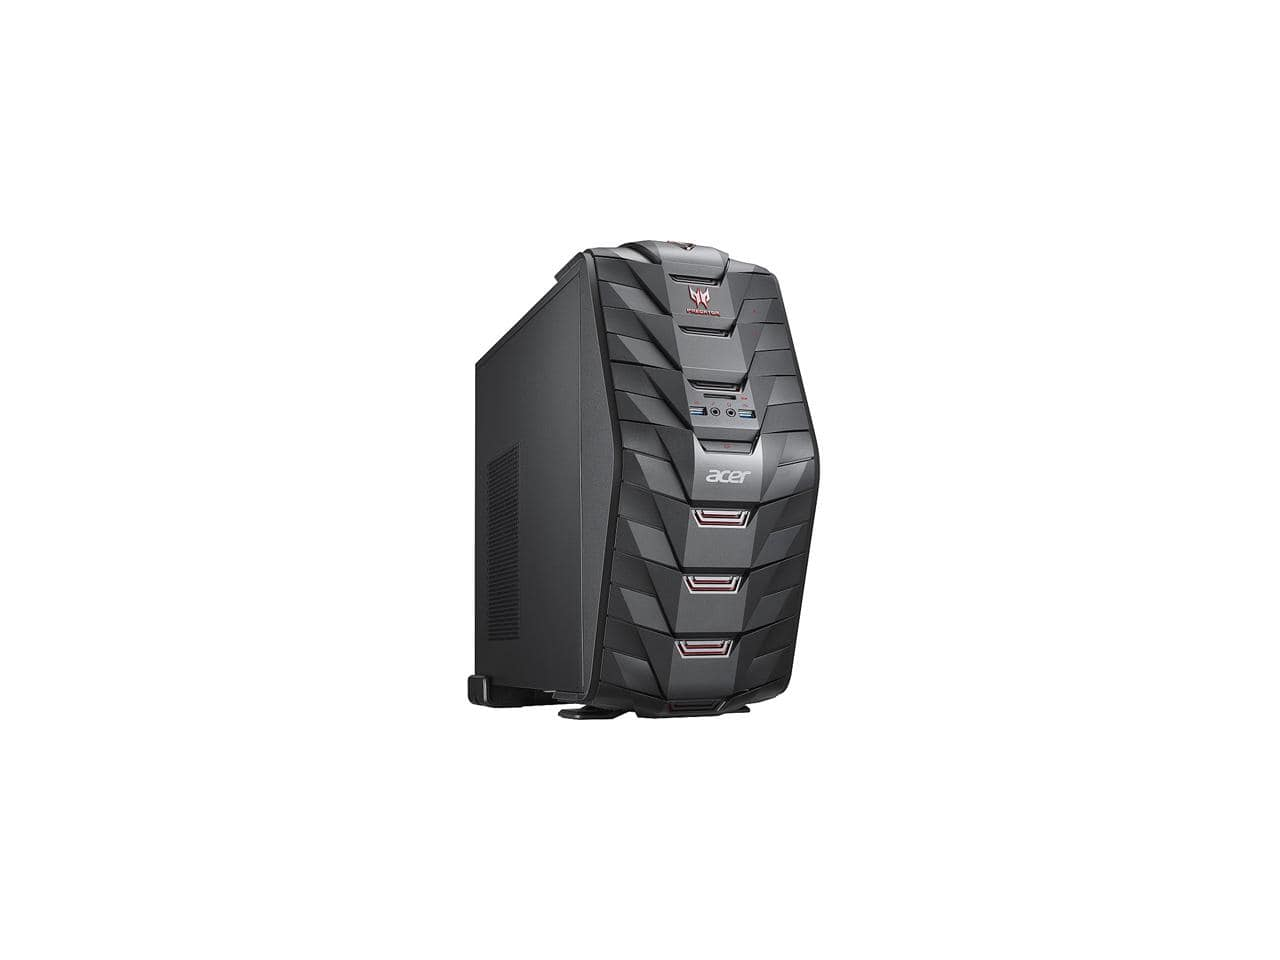 Acer Desktop: i5-6400, 8GB RAM, 128GB SSD + 1TB HDD, GTX 1060 w/ Acer Predator Suitcase V2 $730 + Free Shipping $729.99